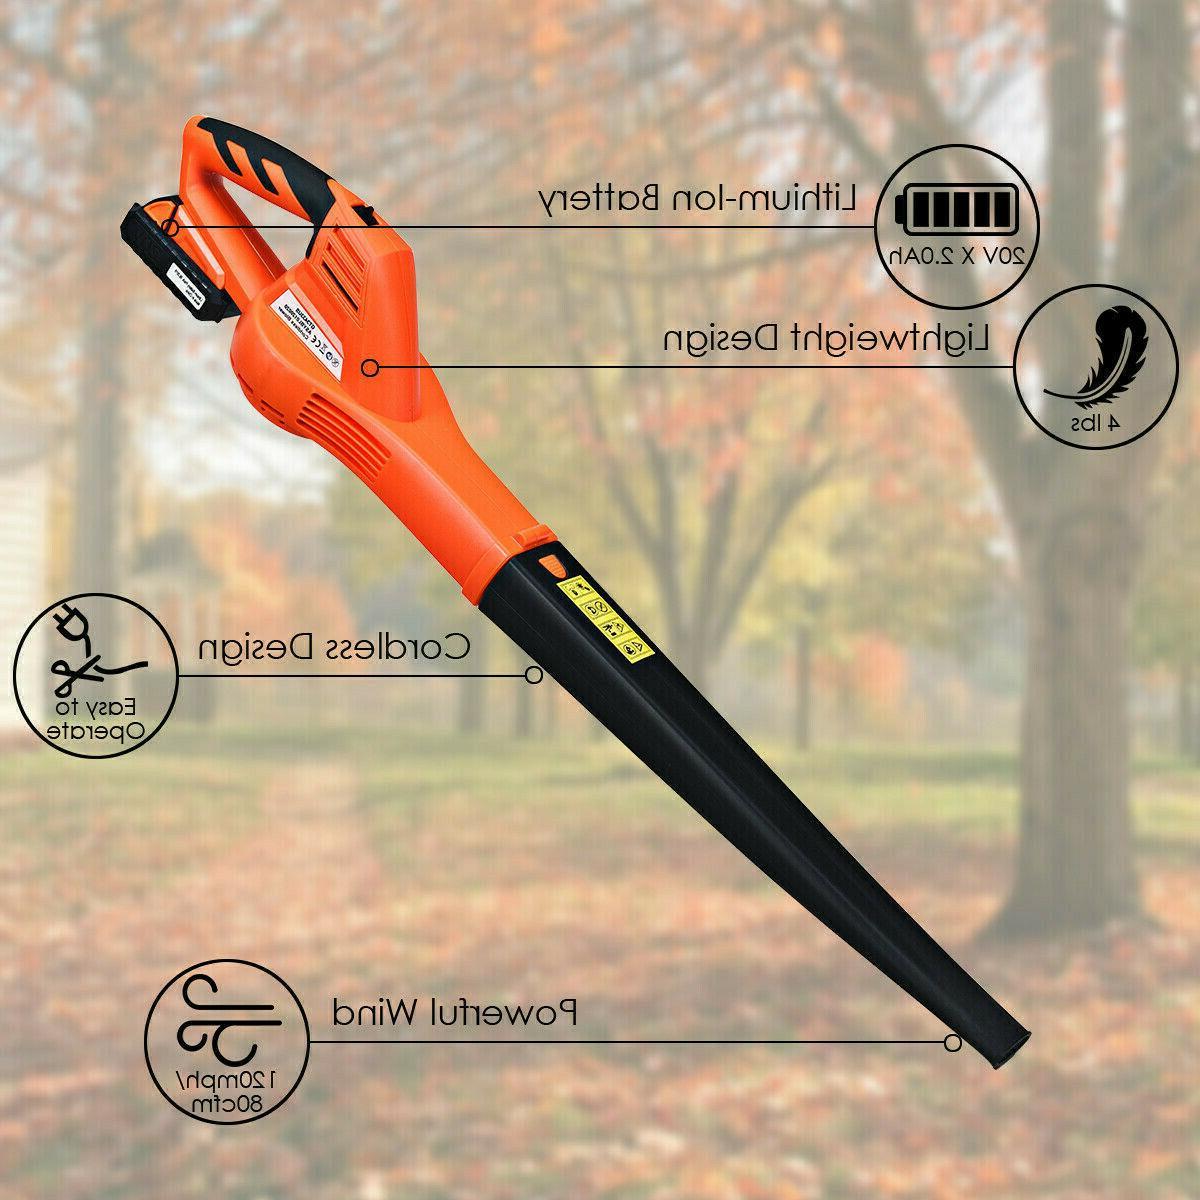 Leaf Cordless Battery Handheld mph New